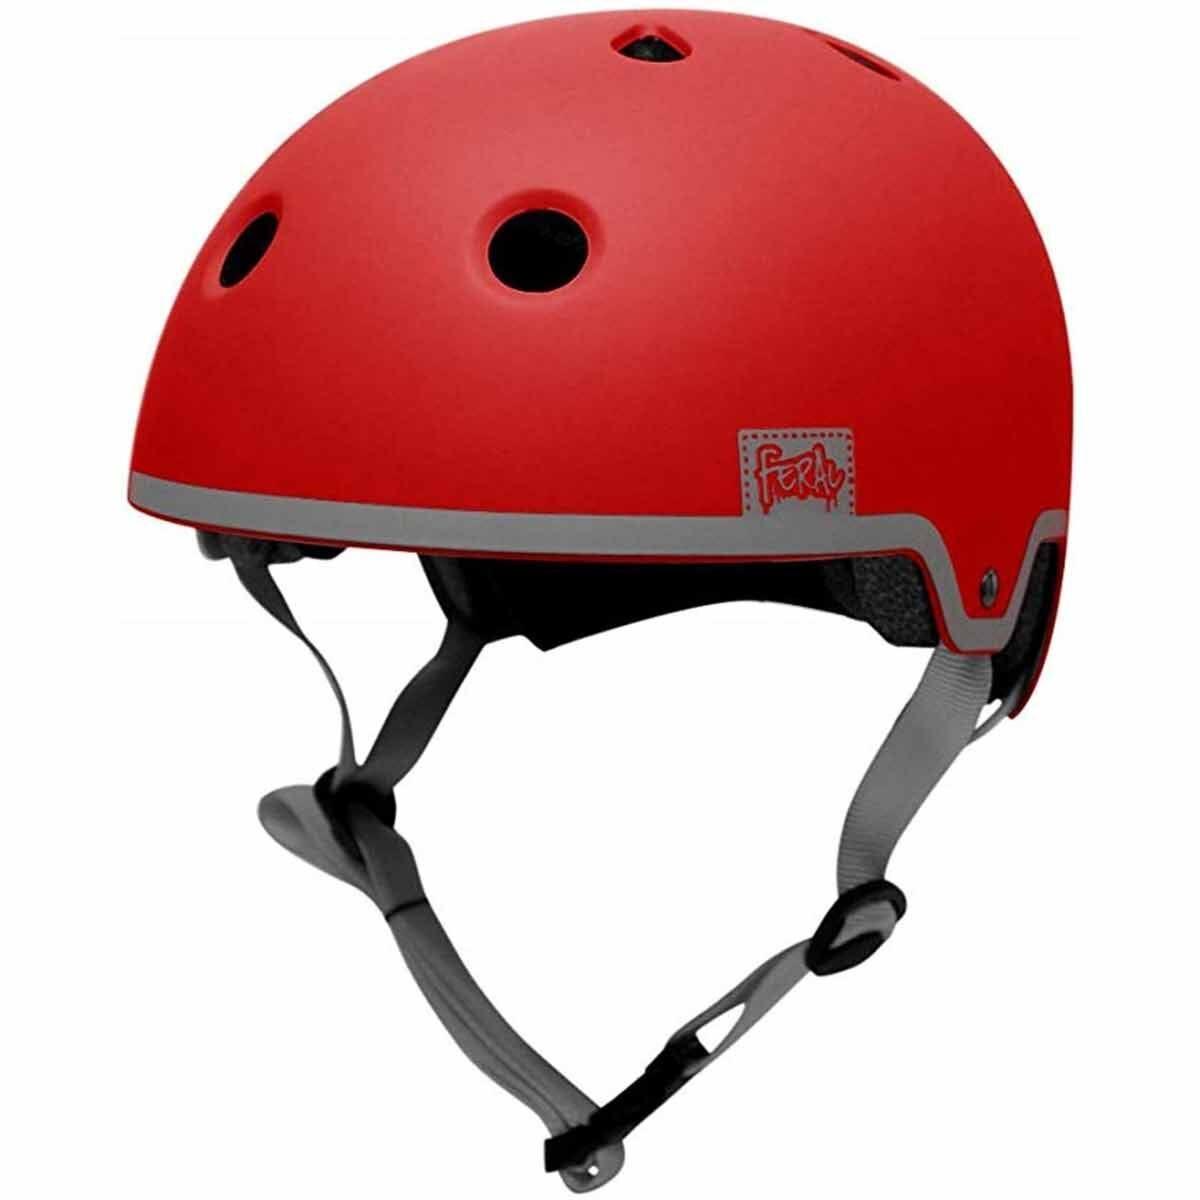 Ferel Park Junior Bicycle Helmet 54-58cm Red